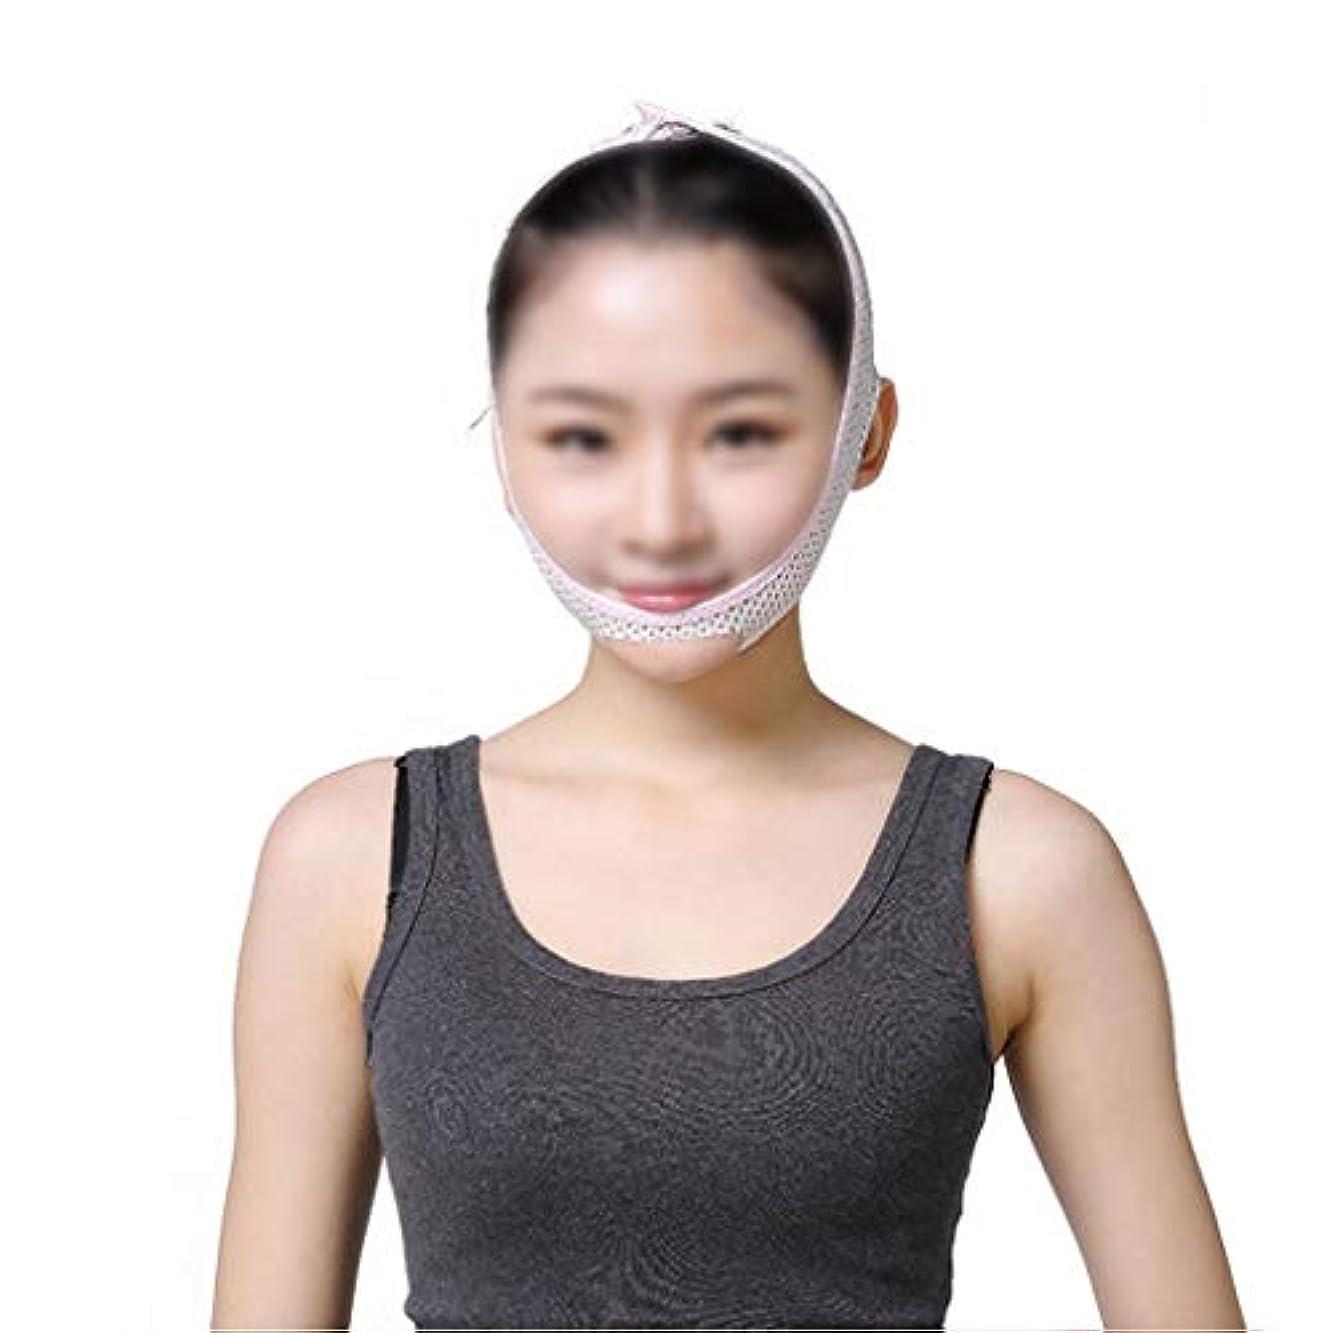 GLJJQMY 薄い顔のマスク快適な 引き締め肌の引き締め睡眠薄い顔のアーティファクト抗しわ除去二重あご術後回復マスク 顔用整形マスク